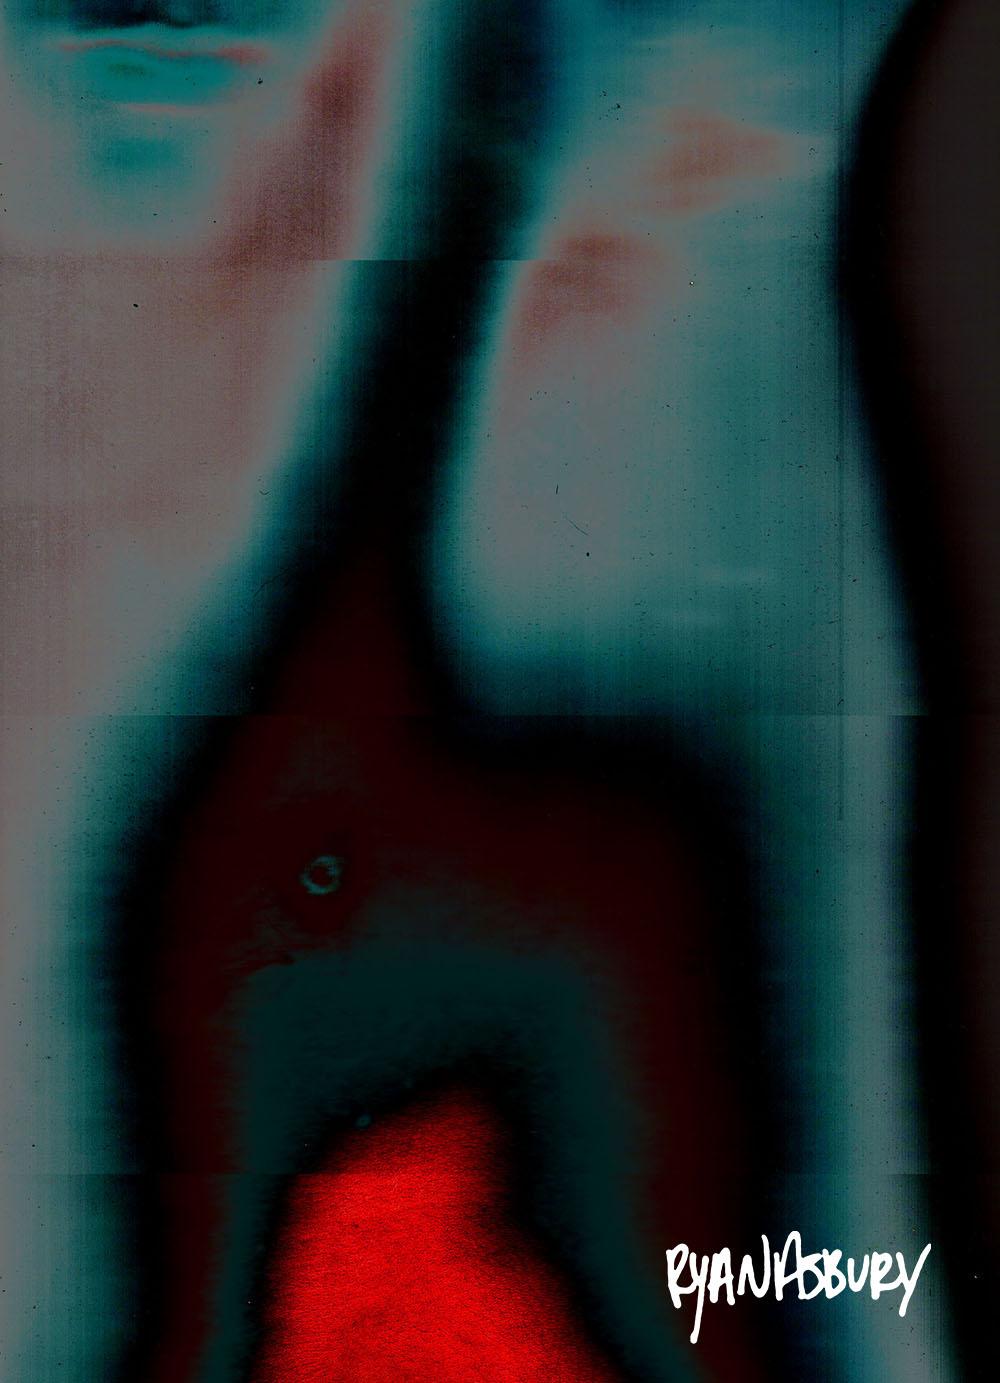 img003 curves 1000 1 R.jpg